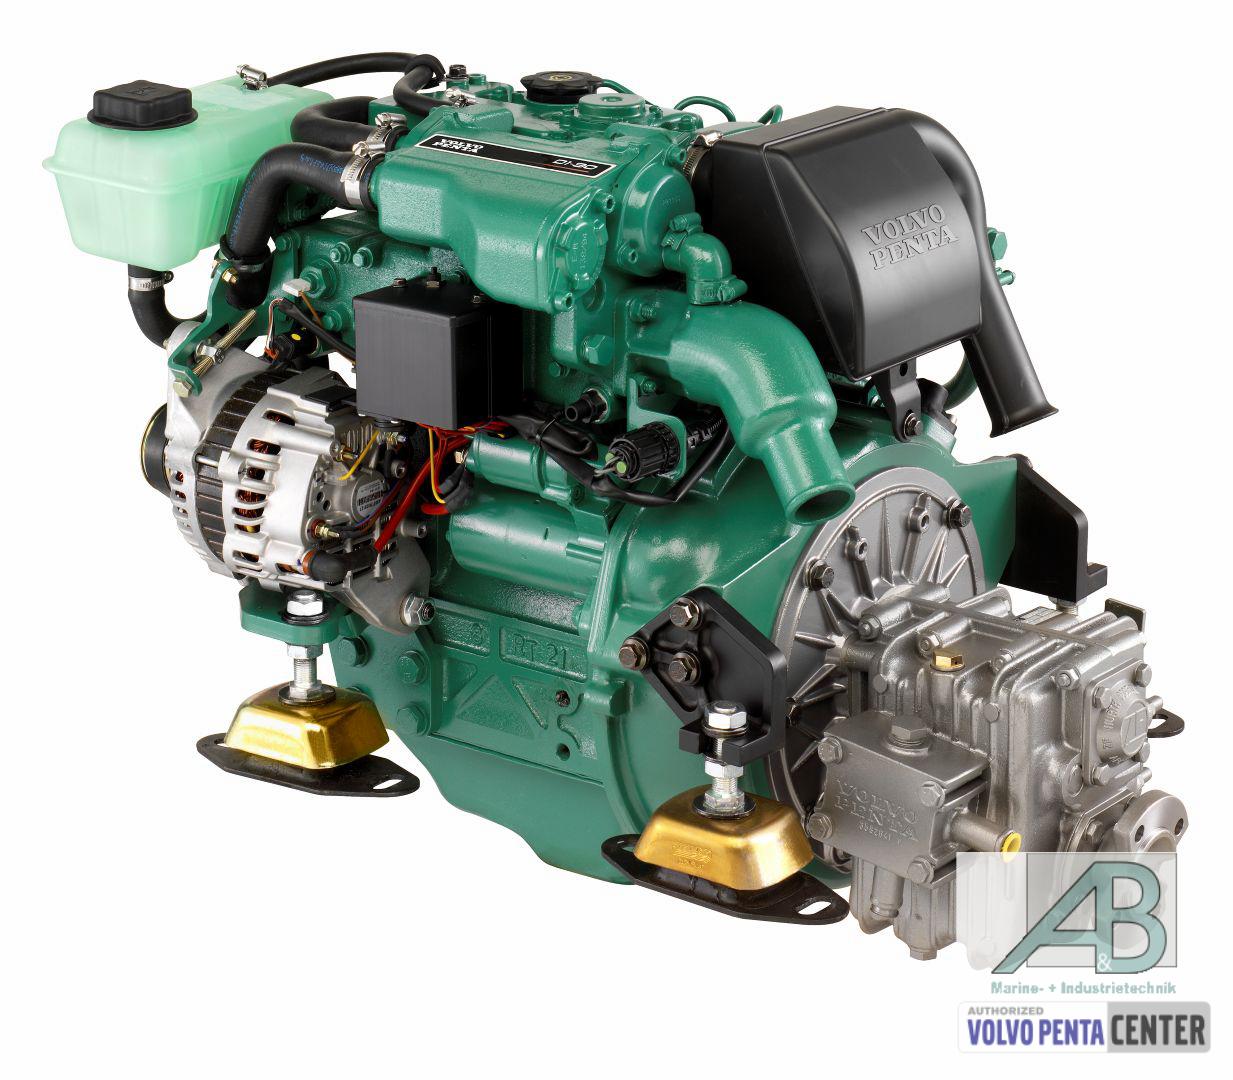 Volvo Penta - Kompakt Diesel